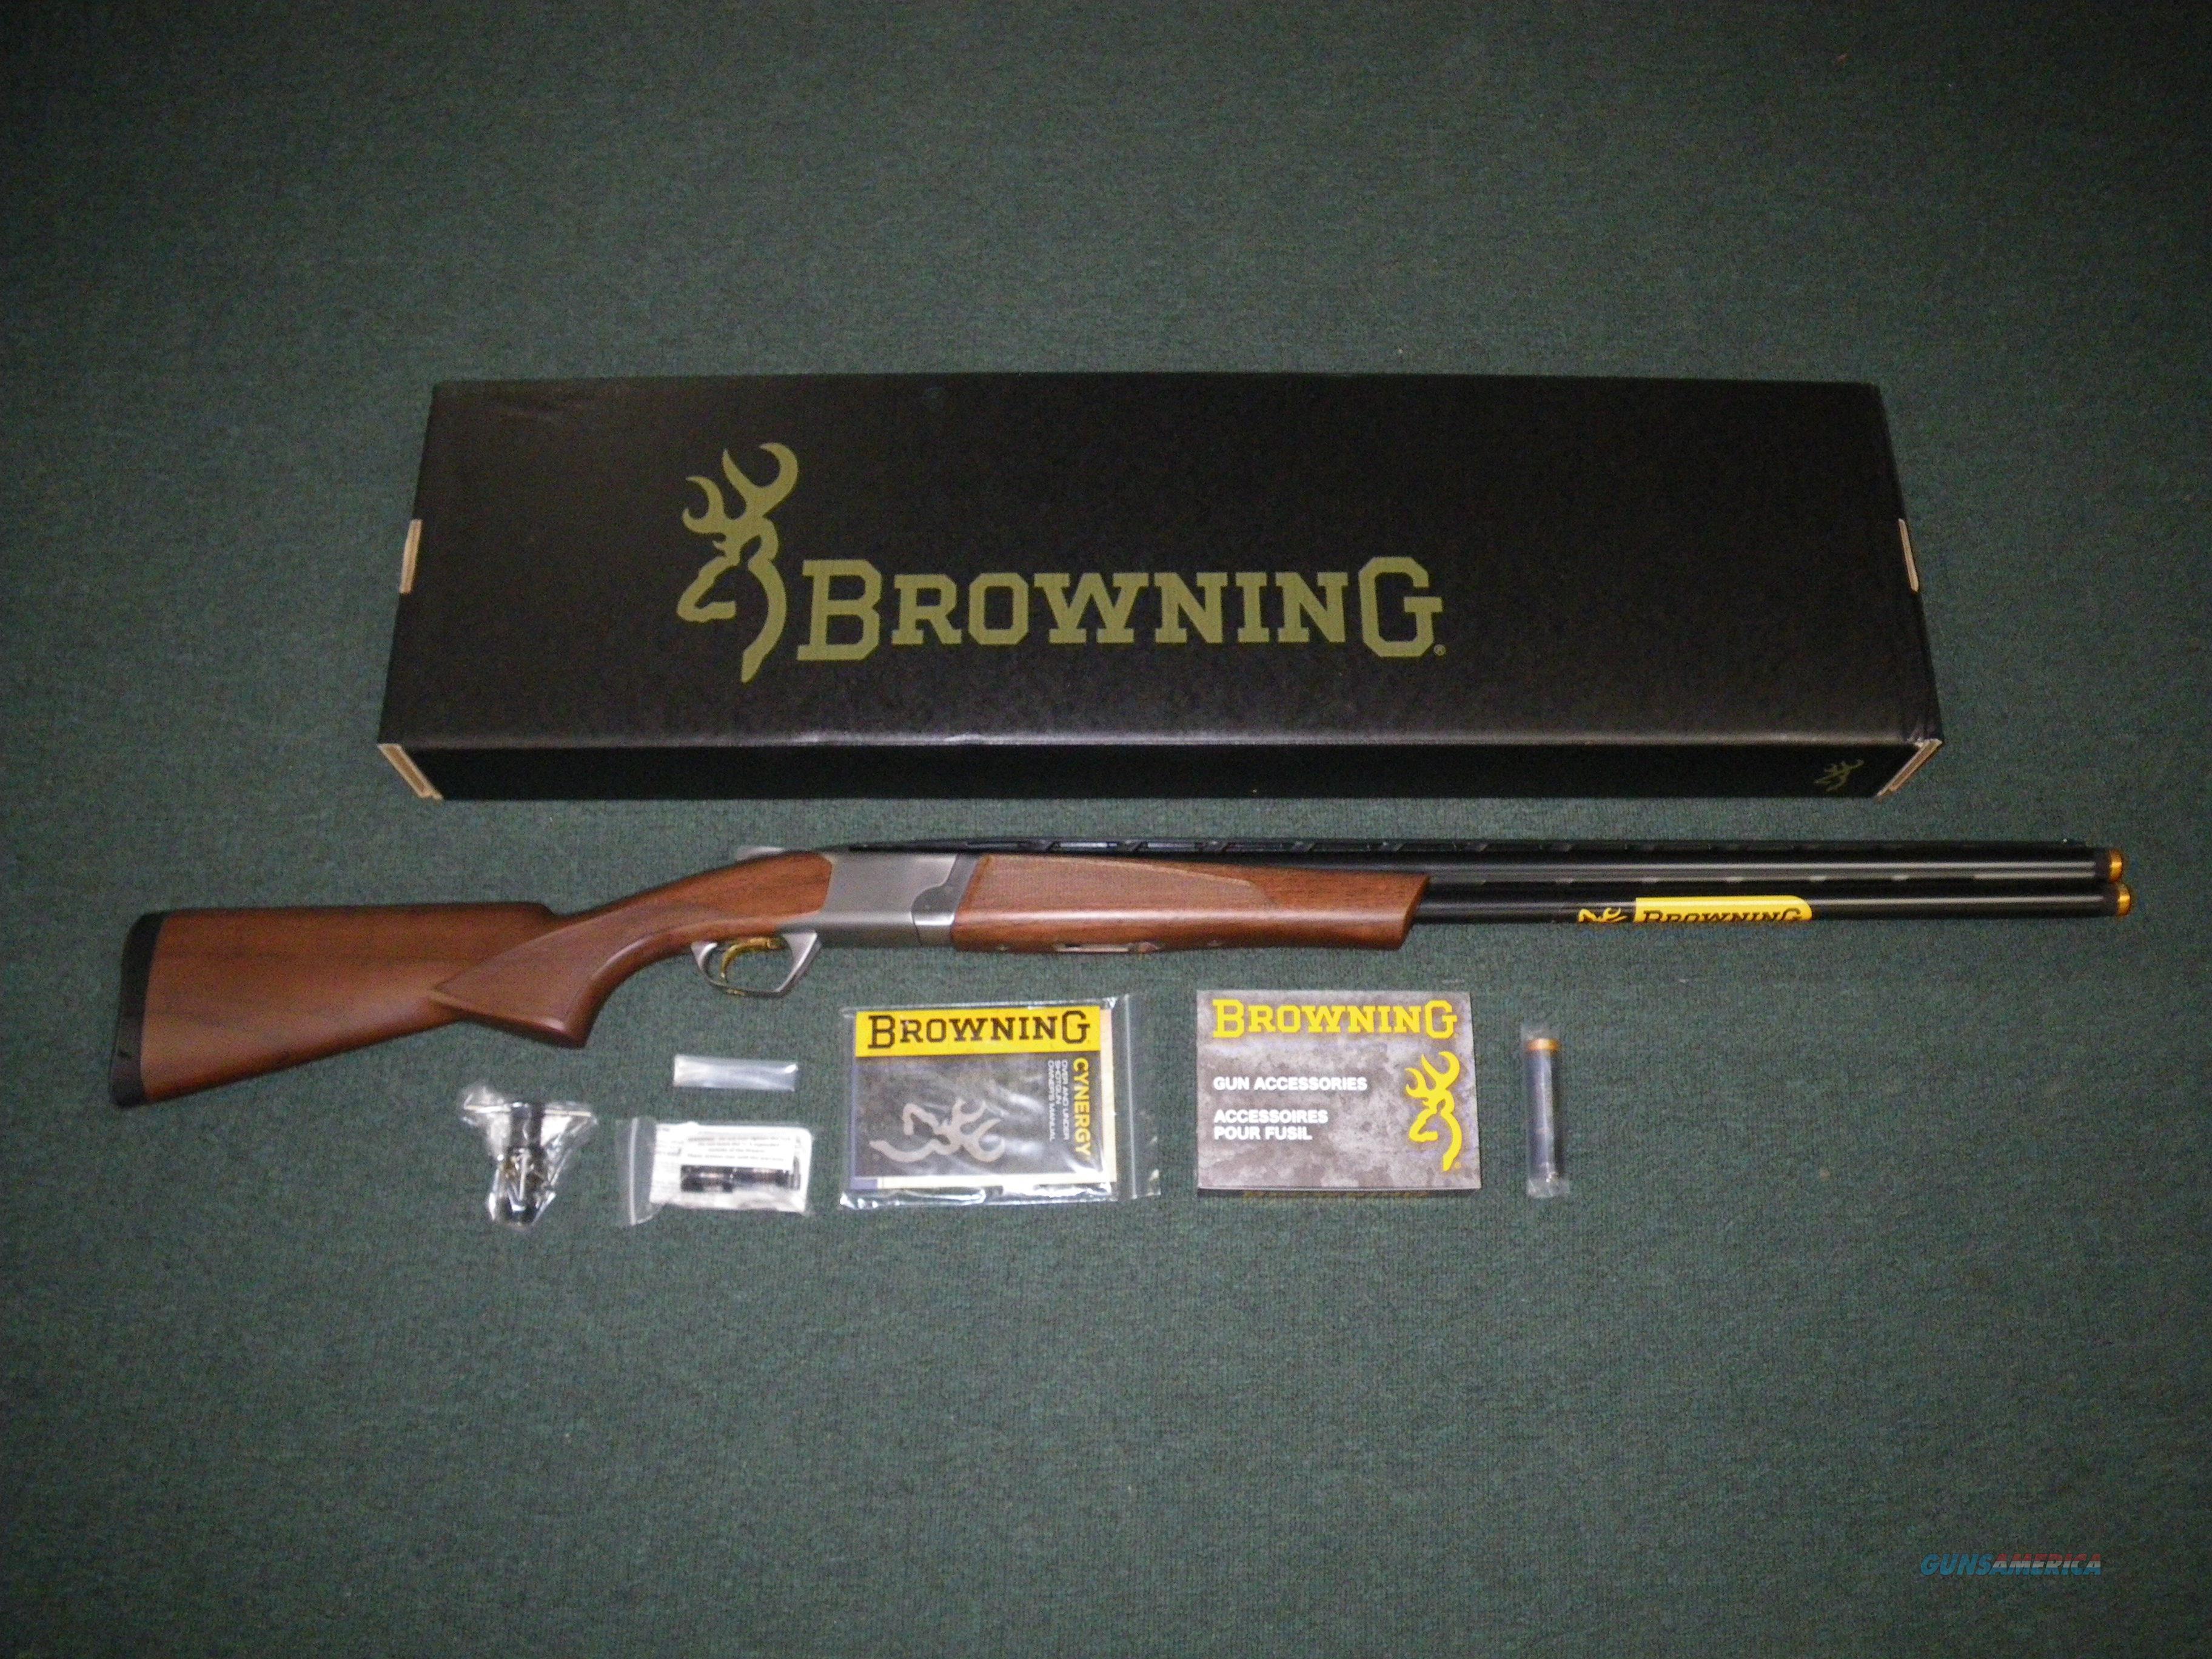 "Browning Cynergy CX 12ga 30"" NEW 3"" Chamber #018709303  Guns > Shotguns > Browning Shotguns > Over Unders > Cynergy > Hunting"